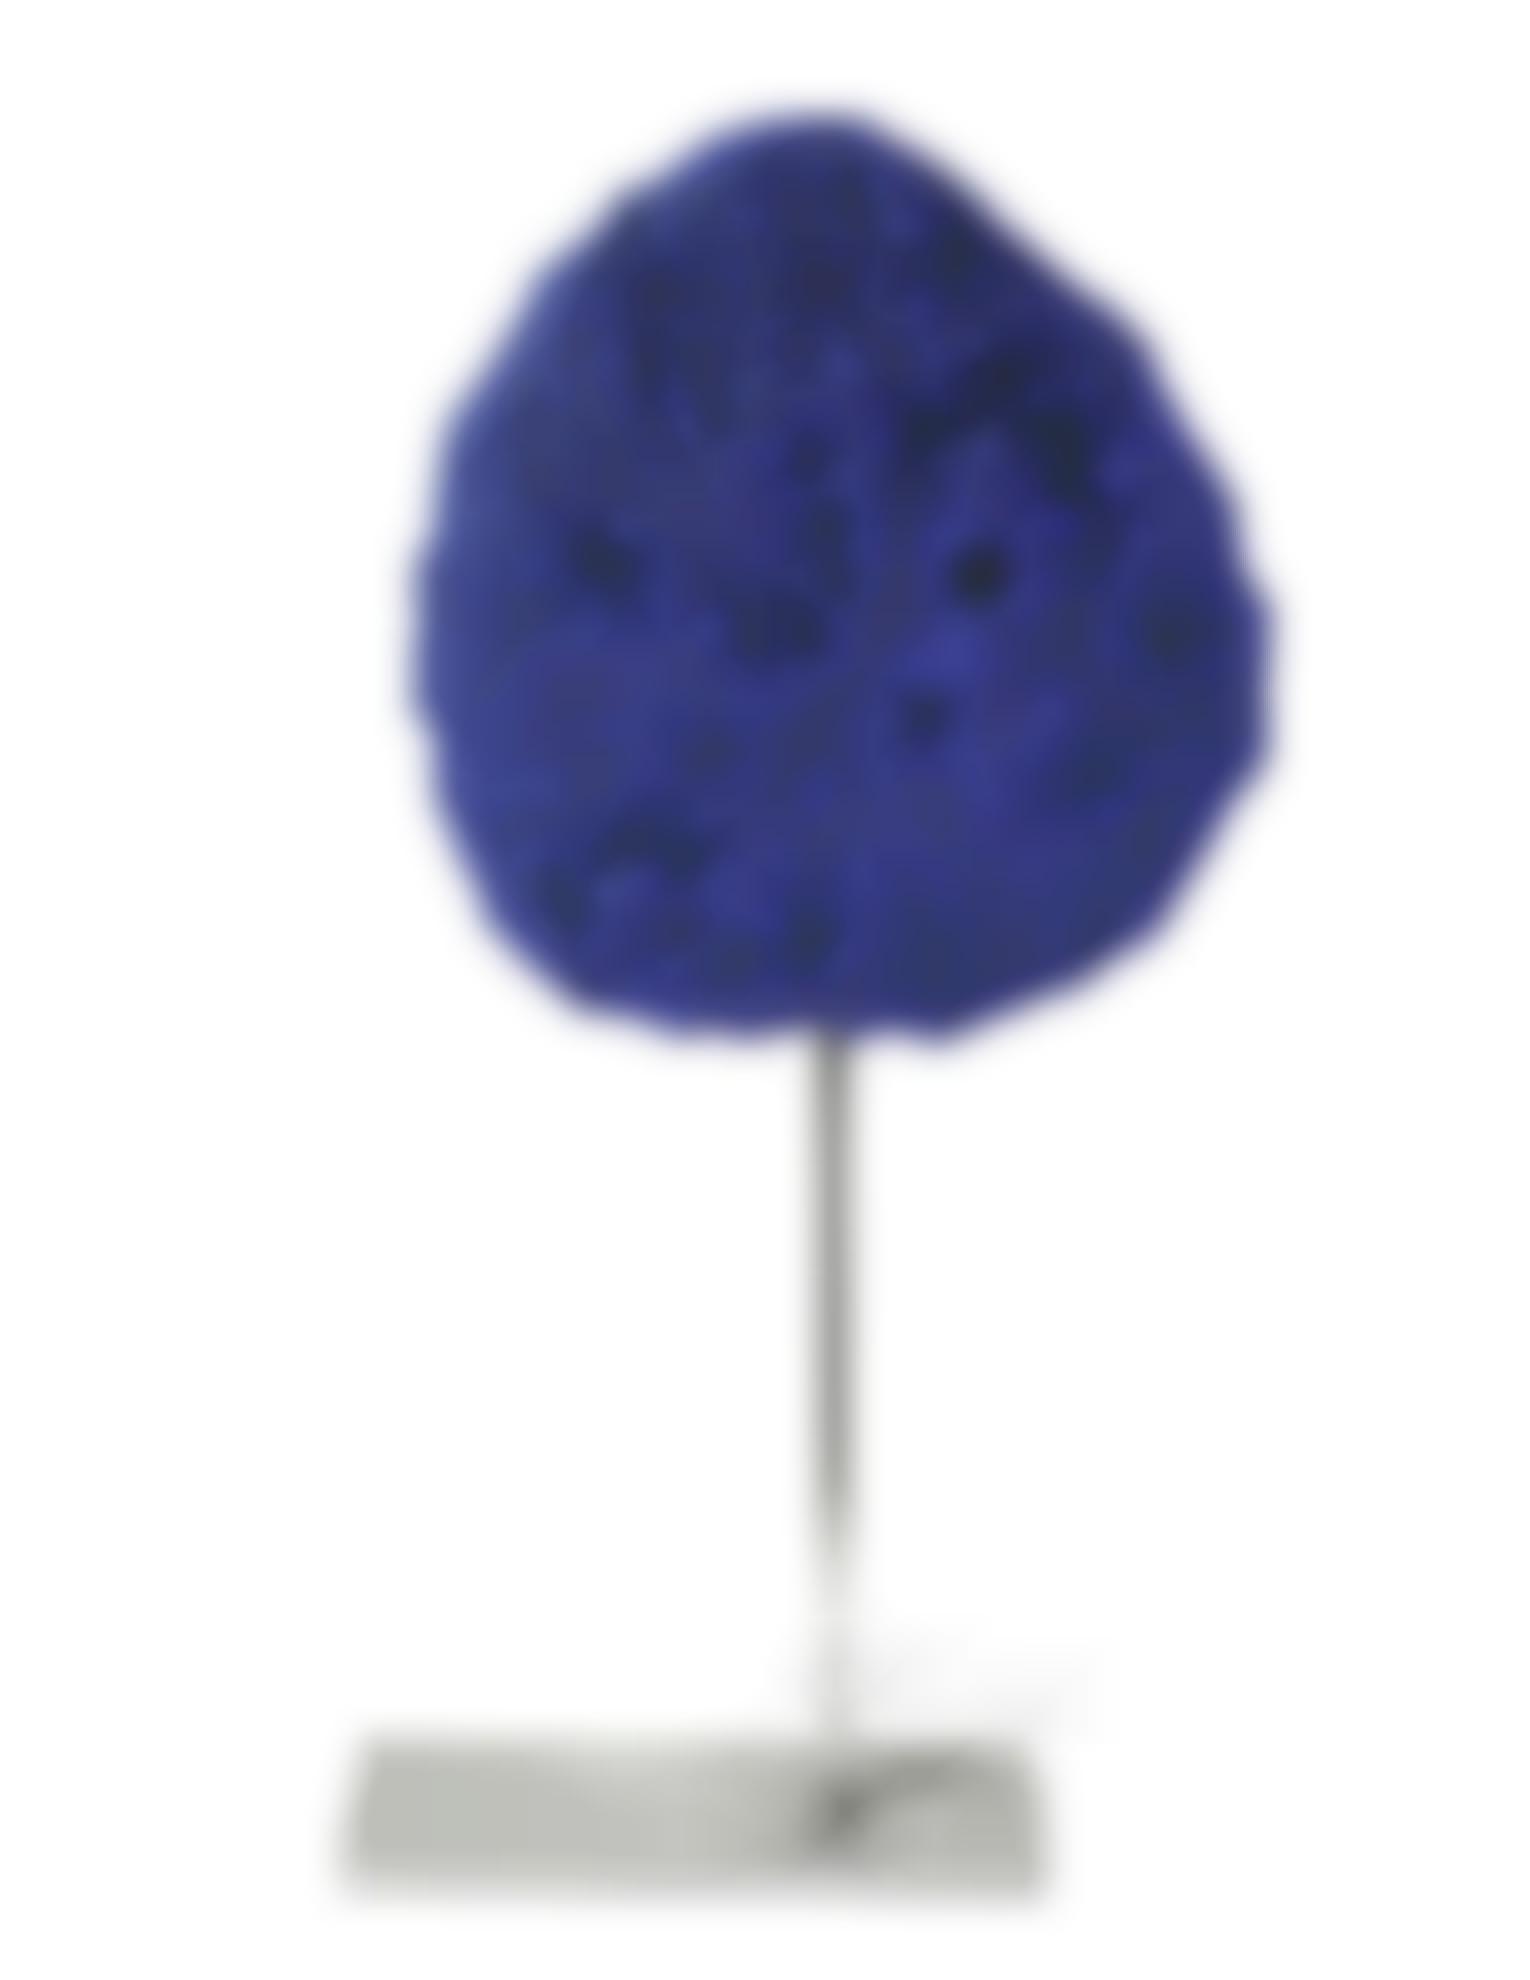 Yves Klein-Untitled Blue Sponge Sculpture, (Se 242)-1960